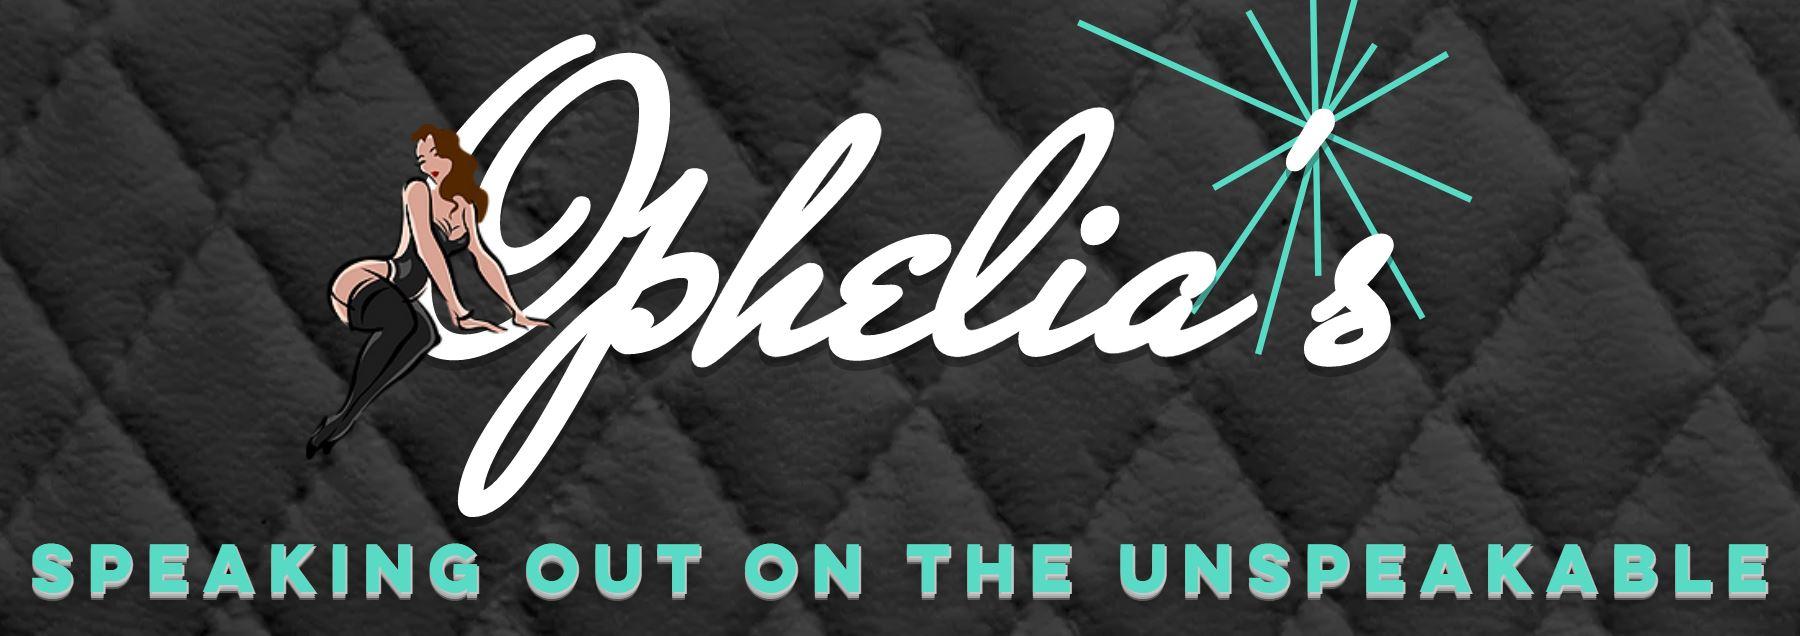 Fearless Ophelia